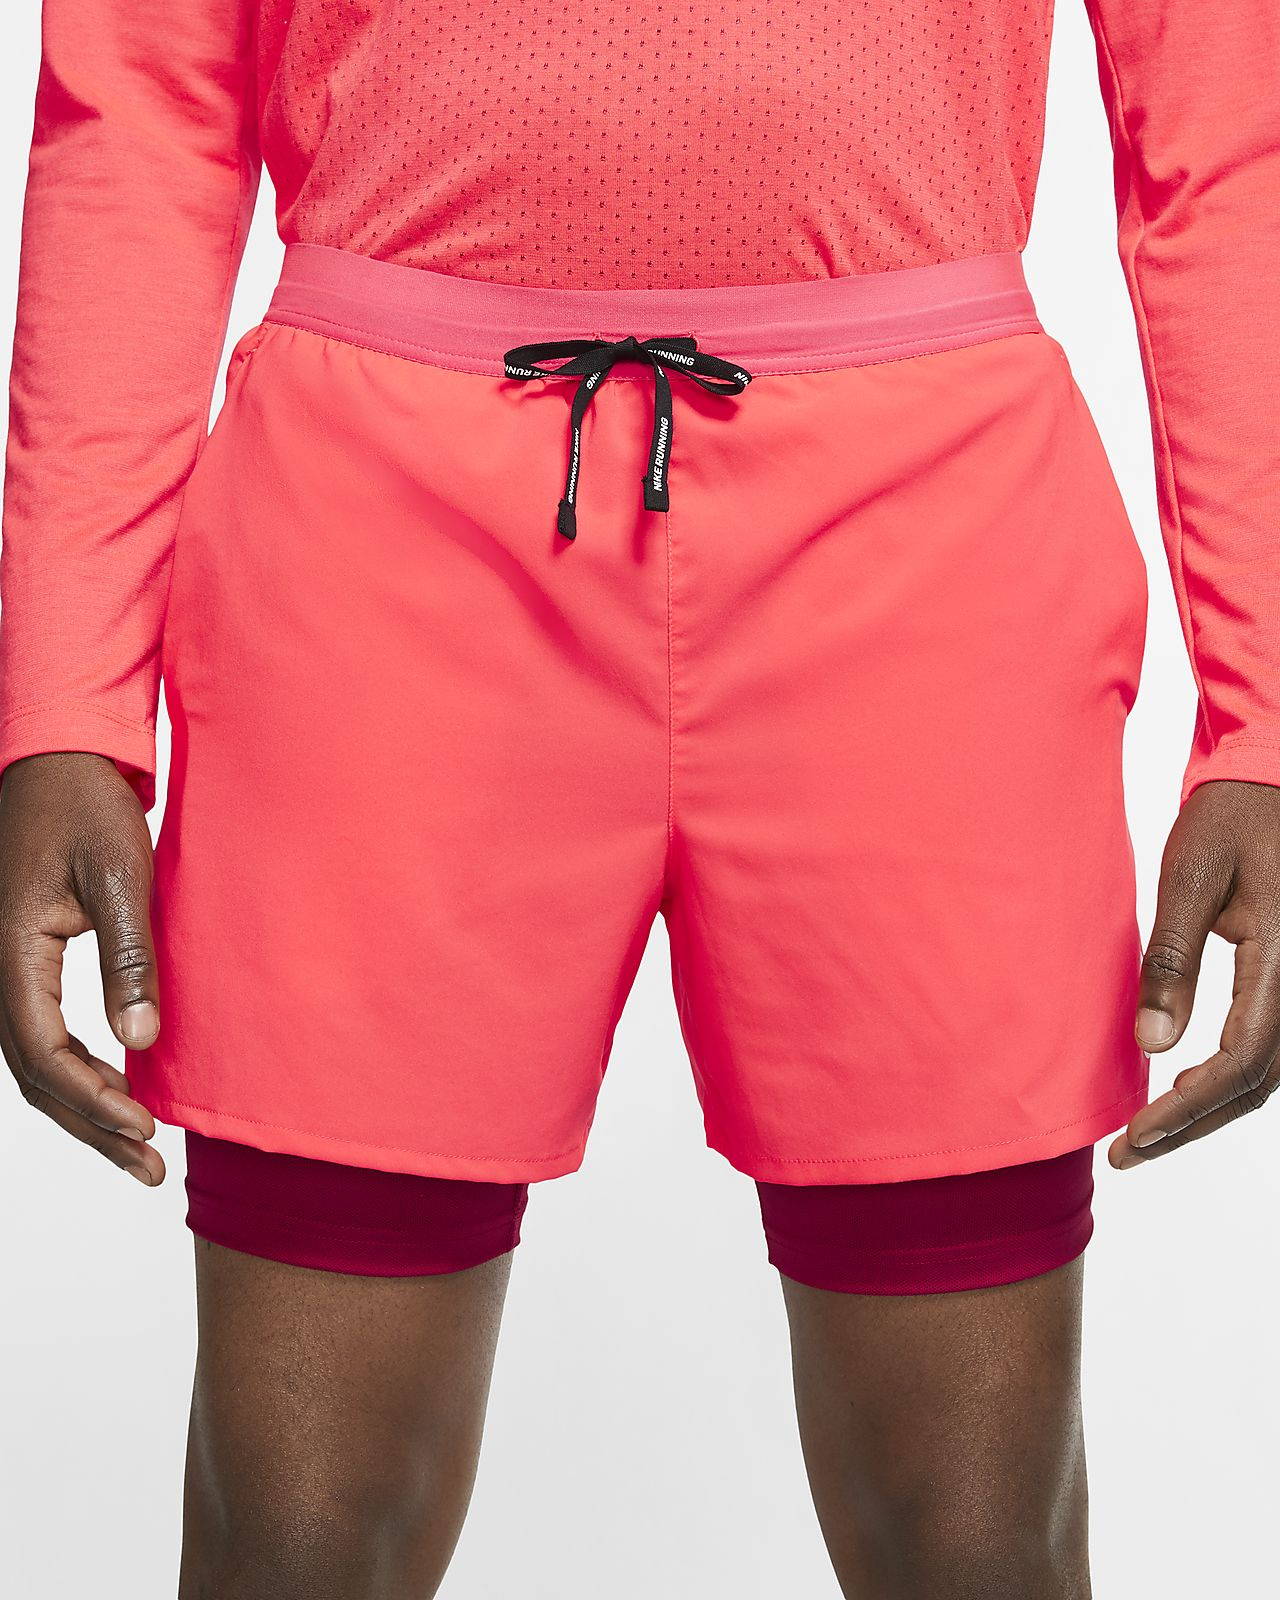 Shorts de running 2 en 1 de 13 cm para hombre Nike Flex Stride